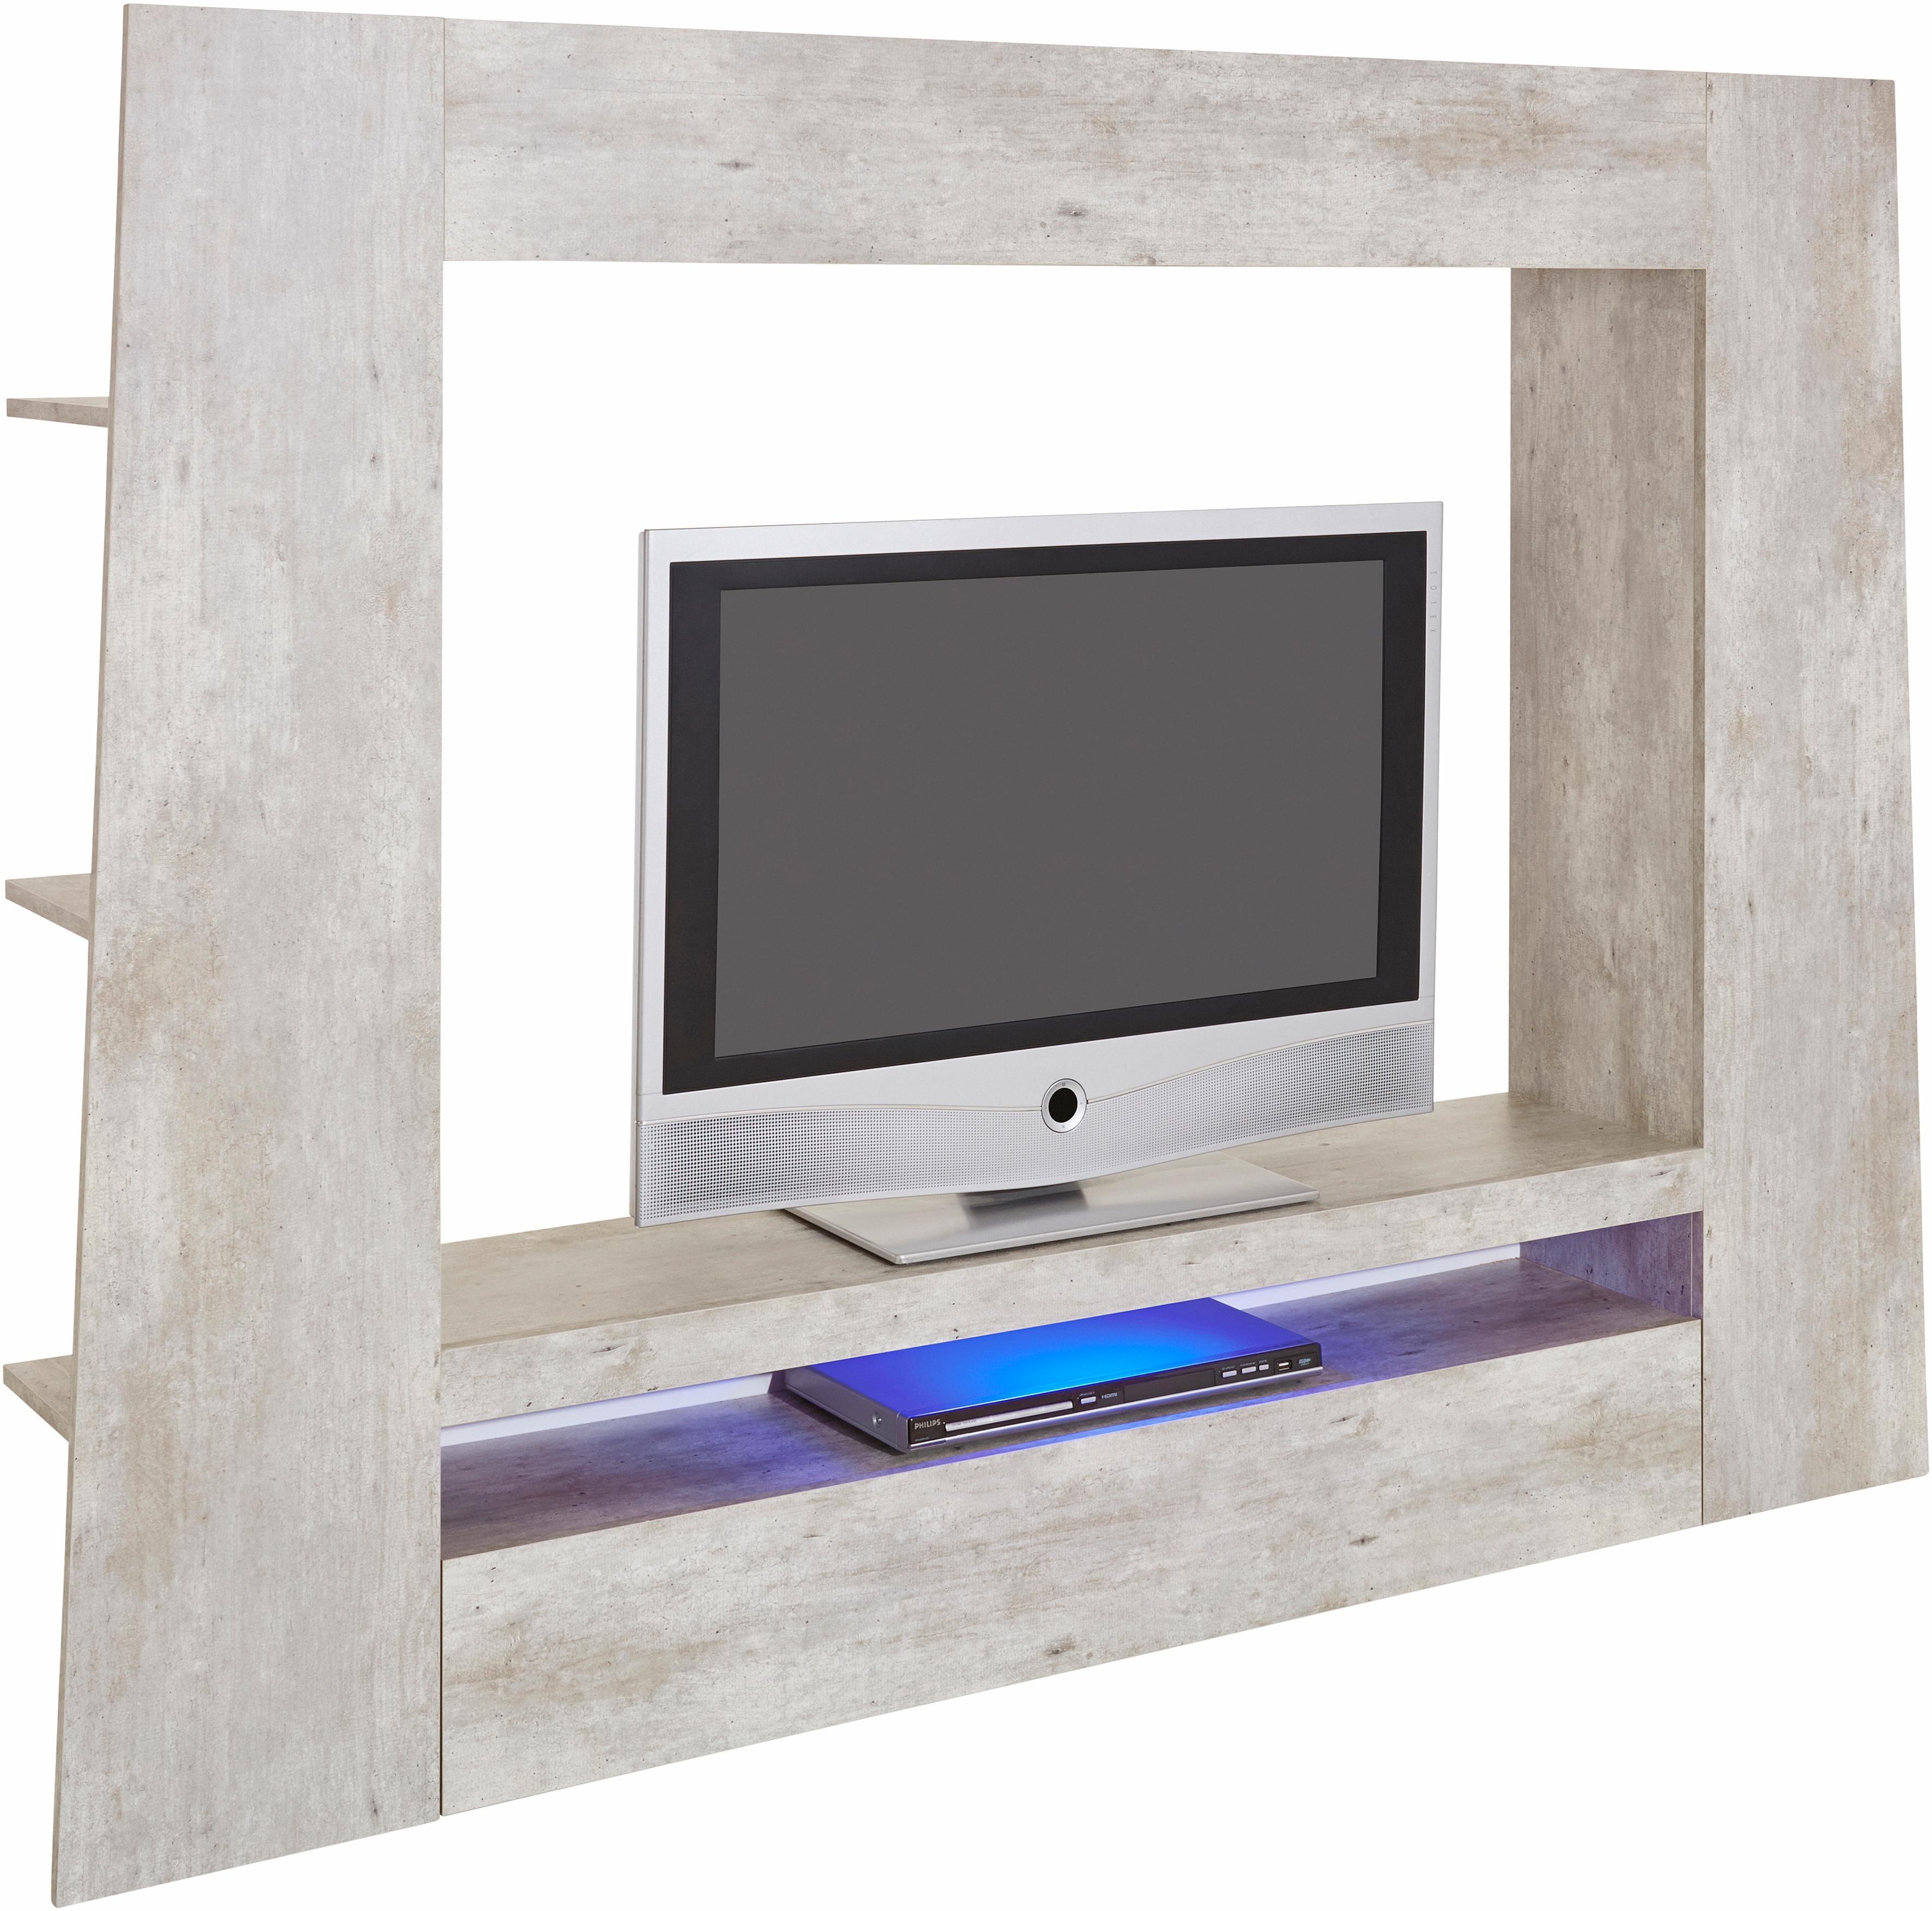 tecnos mediawand breedte 190 cm makkelijk gevonden otto. Black Bedroom Furniture Sets. Home Design Ideas